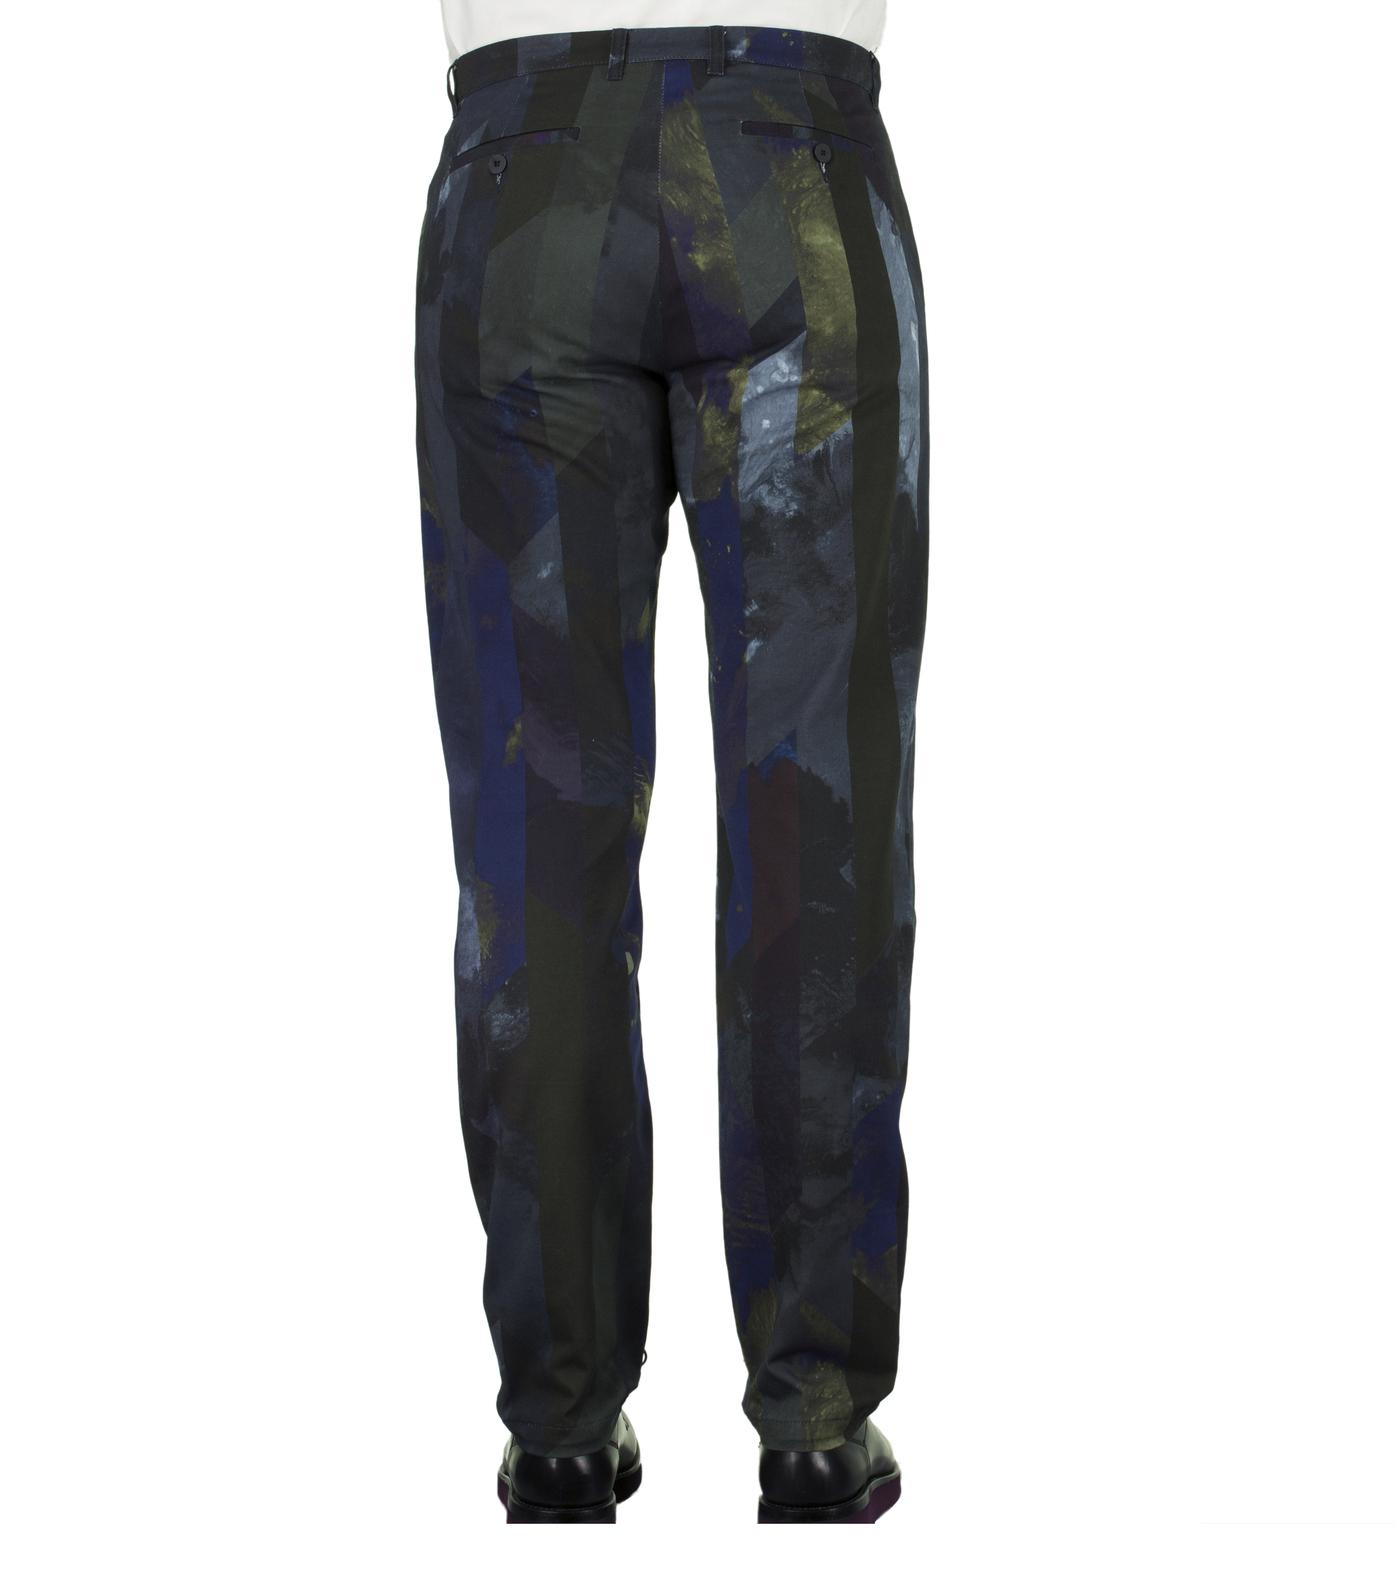 Pants GN6 - Printed blue